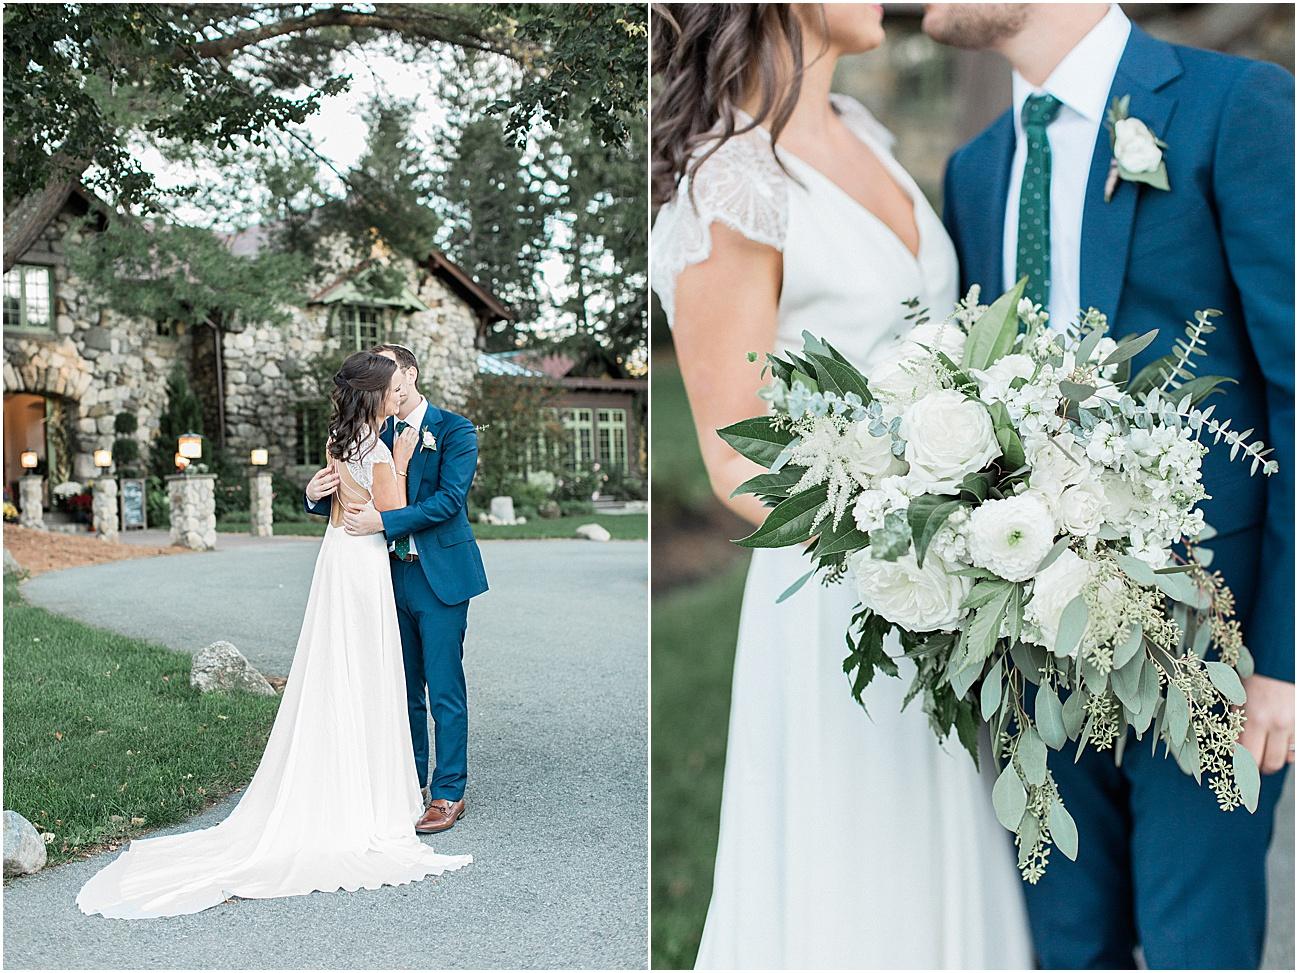 jenna_mike_willowdale_estate_topsfield_neutral_whites_greens_fall_cape_cod_boston_wedding_photographer_meredith_jane_photography_photo_1453.jpg